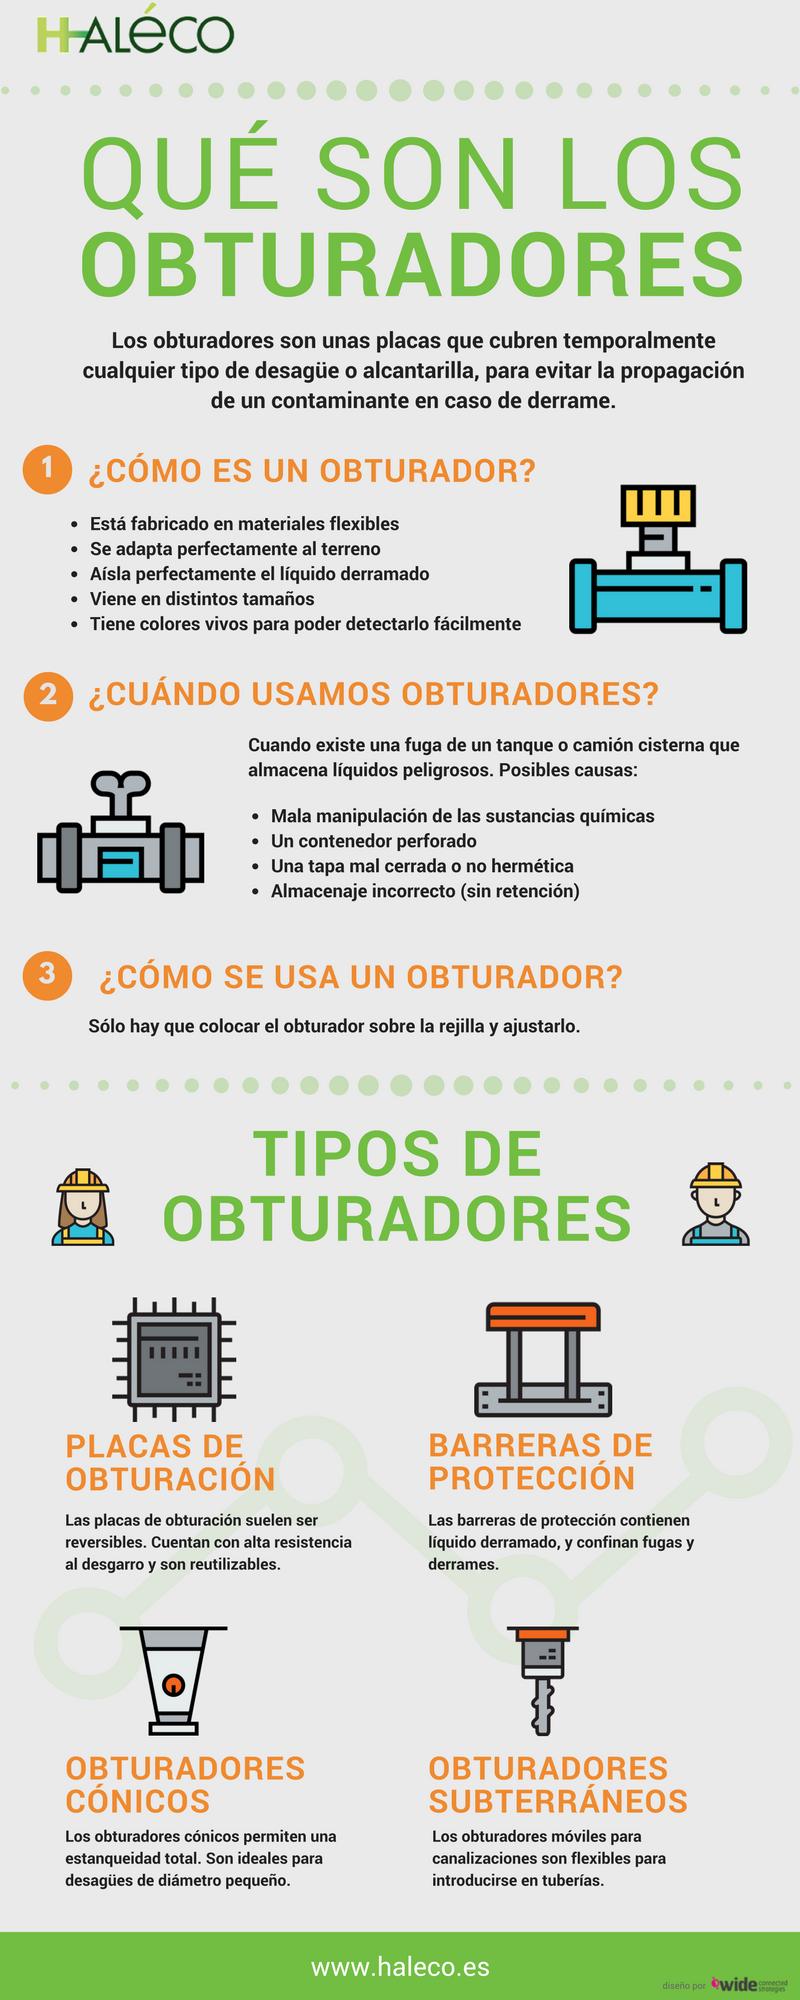 Infografía sobre obturadores 00 | Haleco Iberia